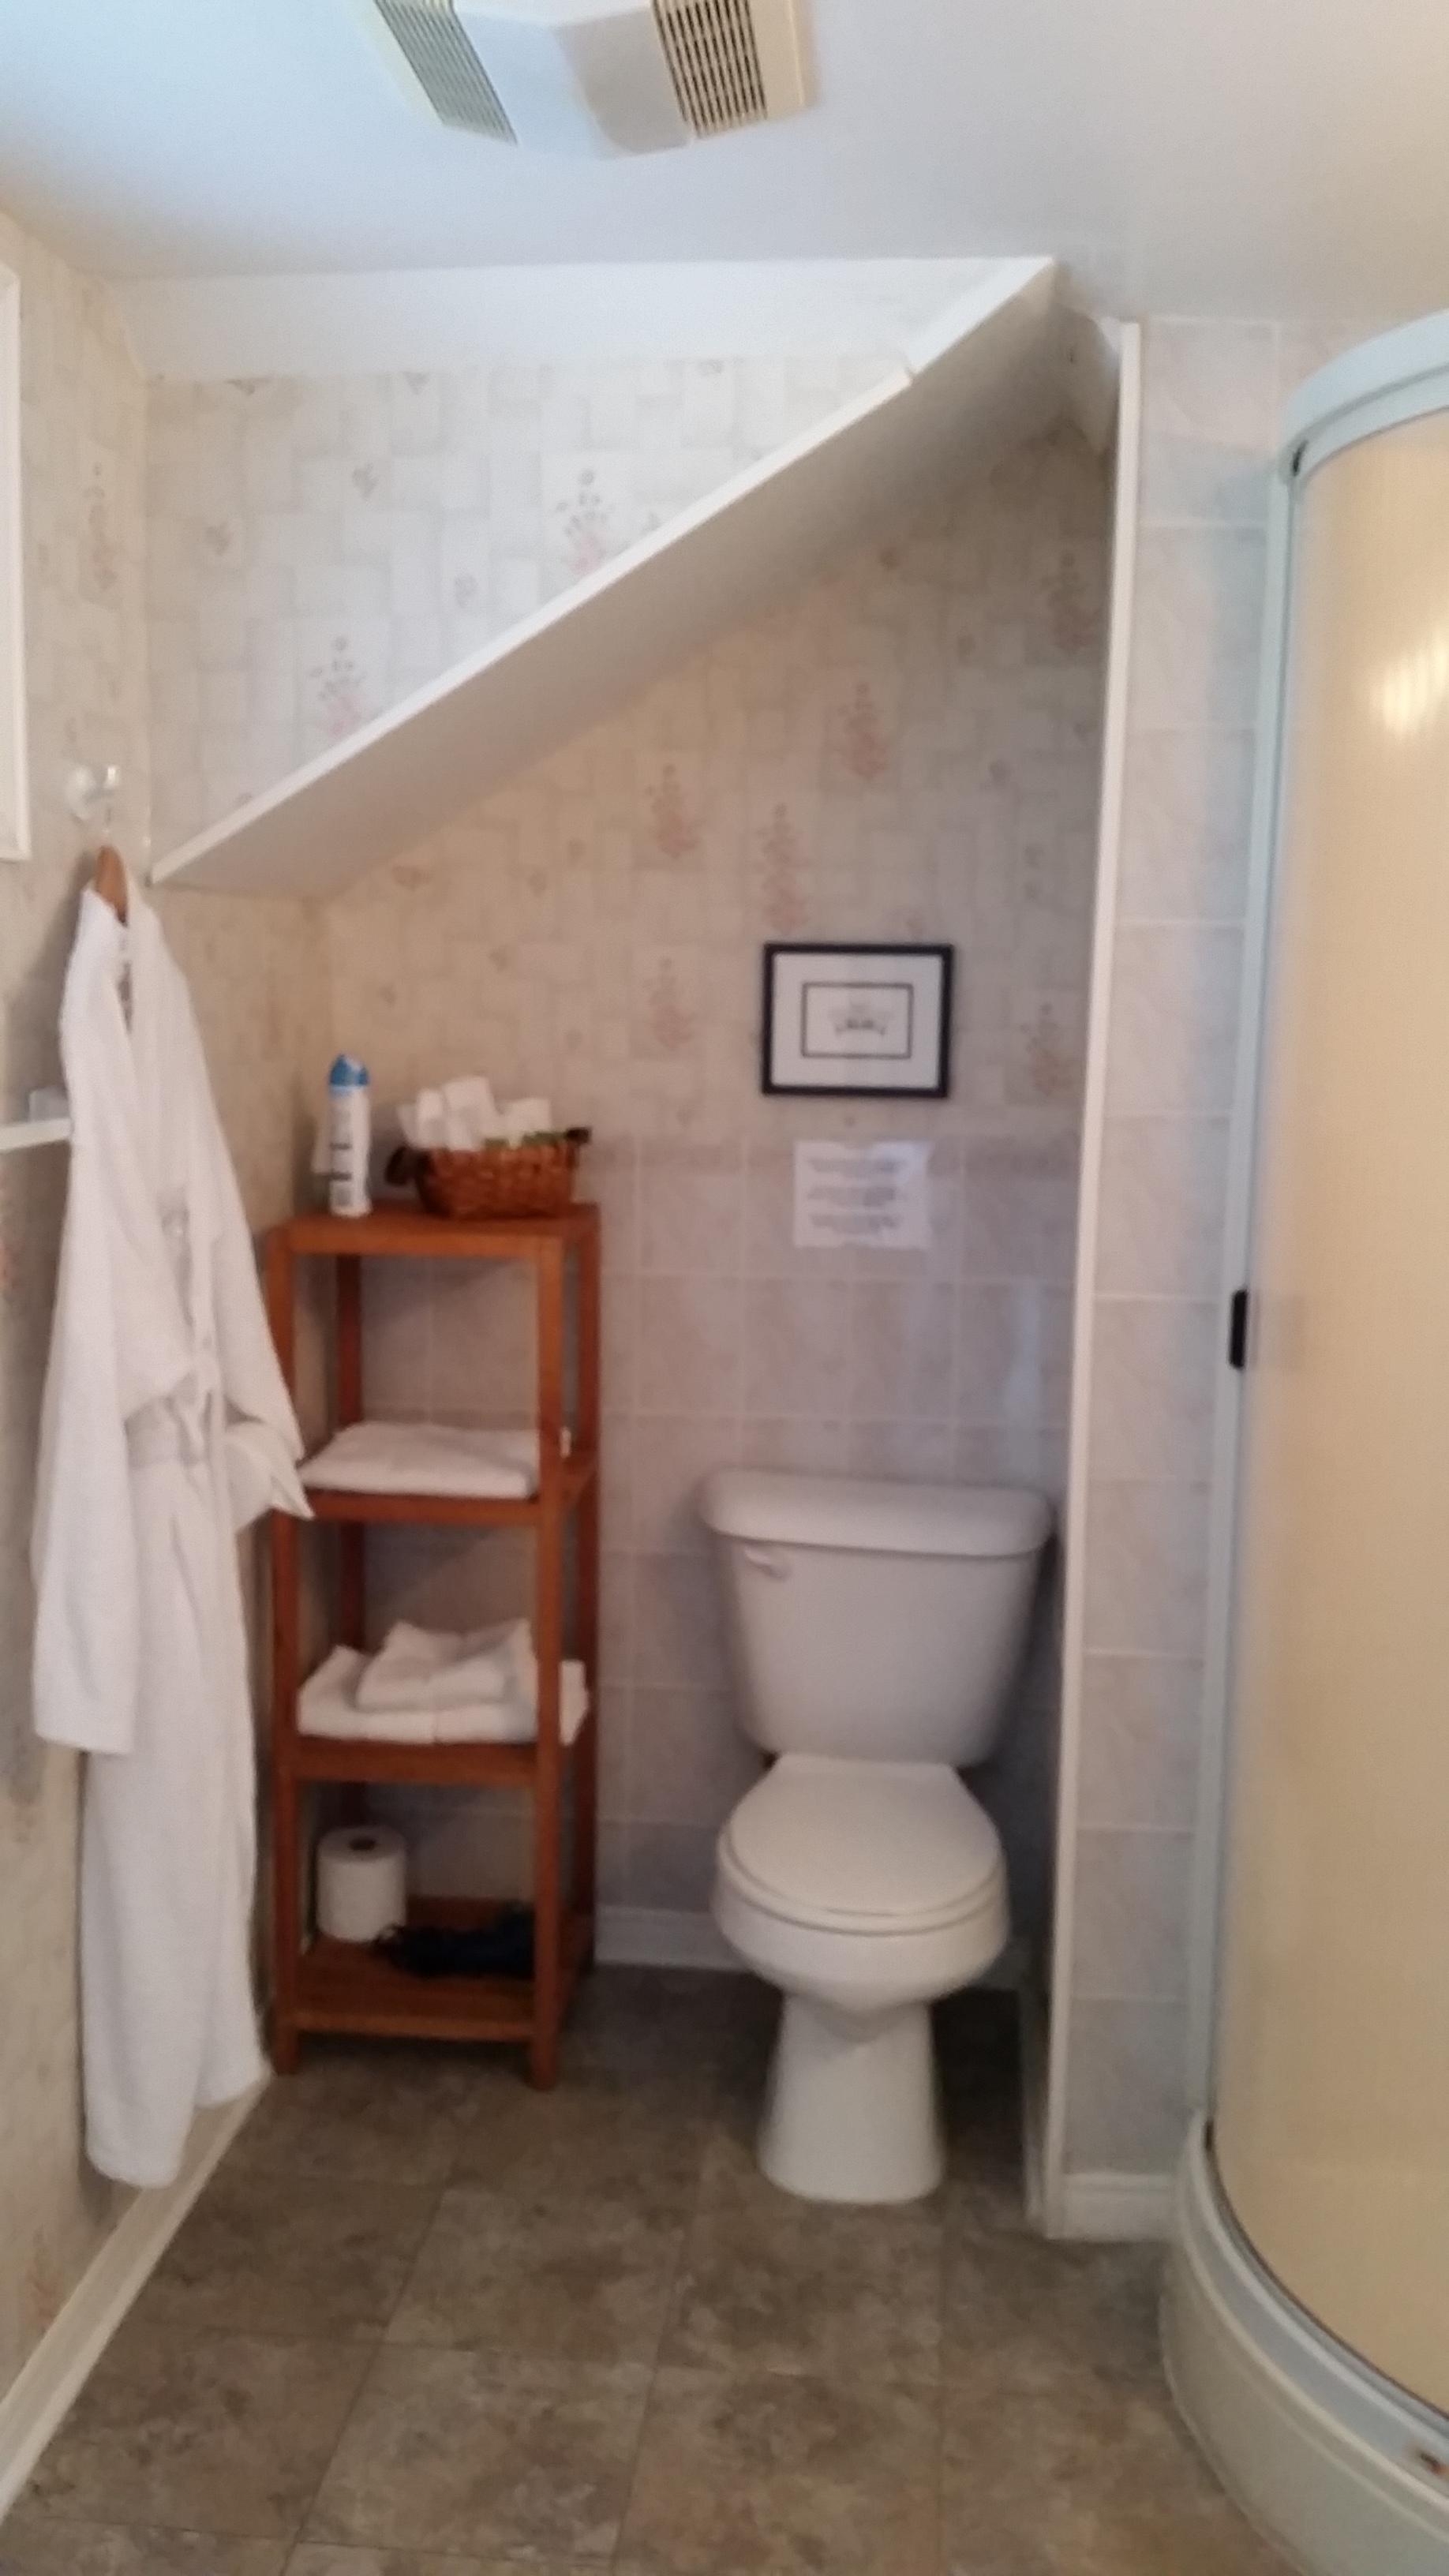 wisteria bathroom may.jpg